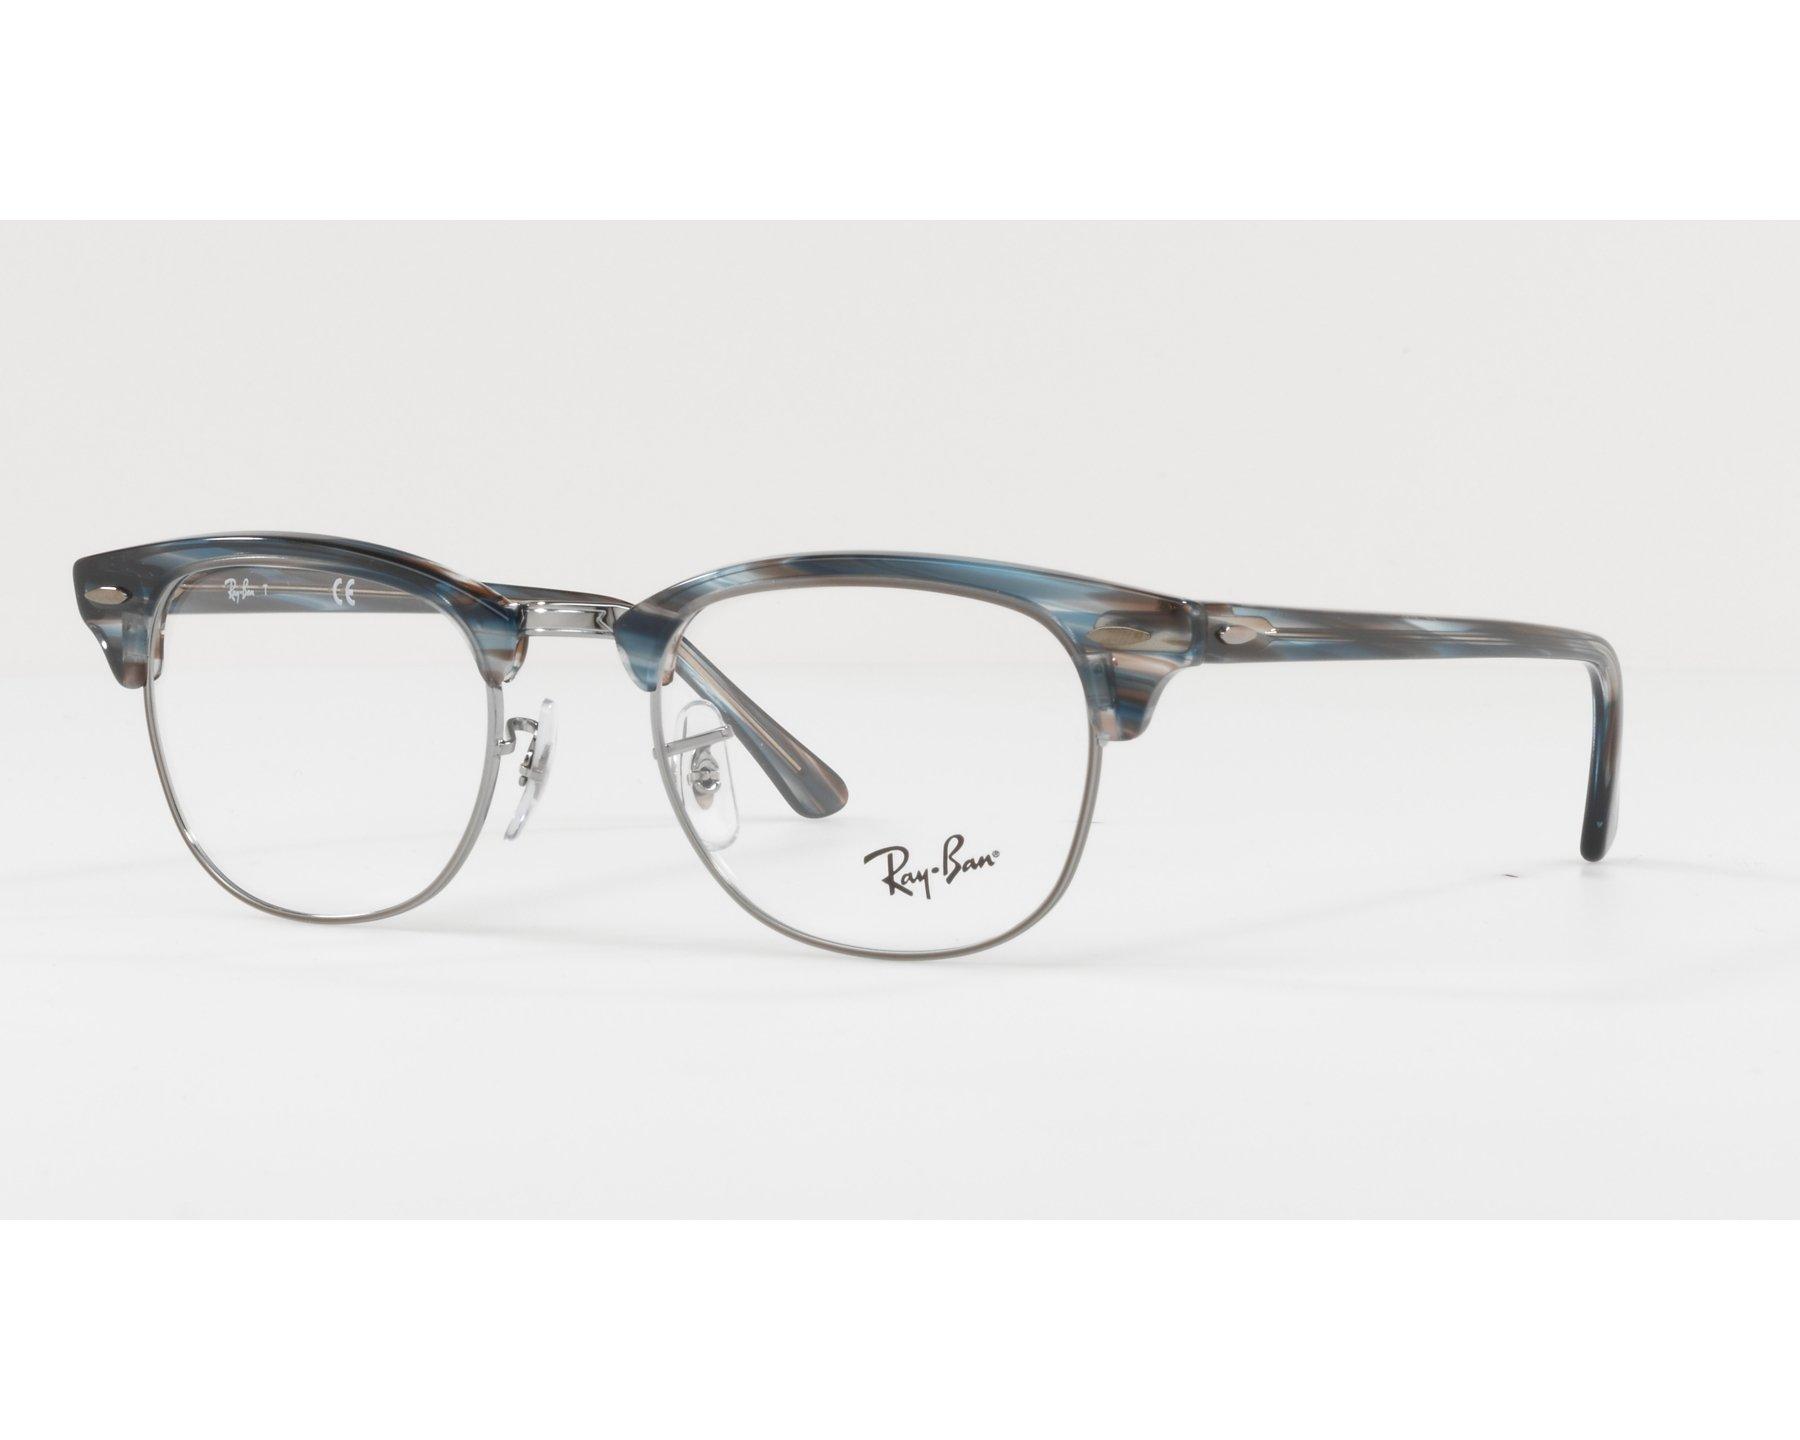 7f64b39be2f eyeglasses Ray-Ban RX-5154 5750 49-21 Green Gun